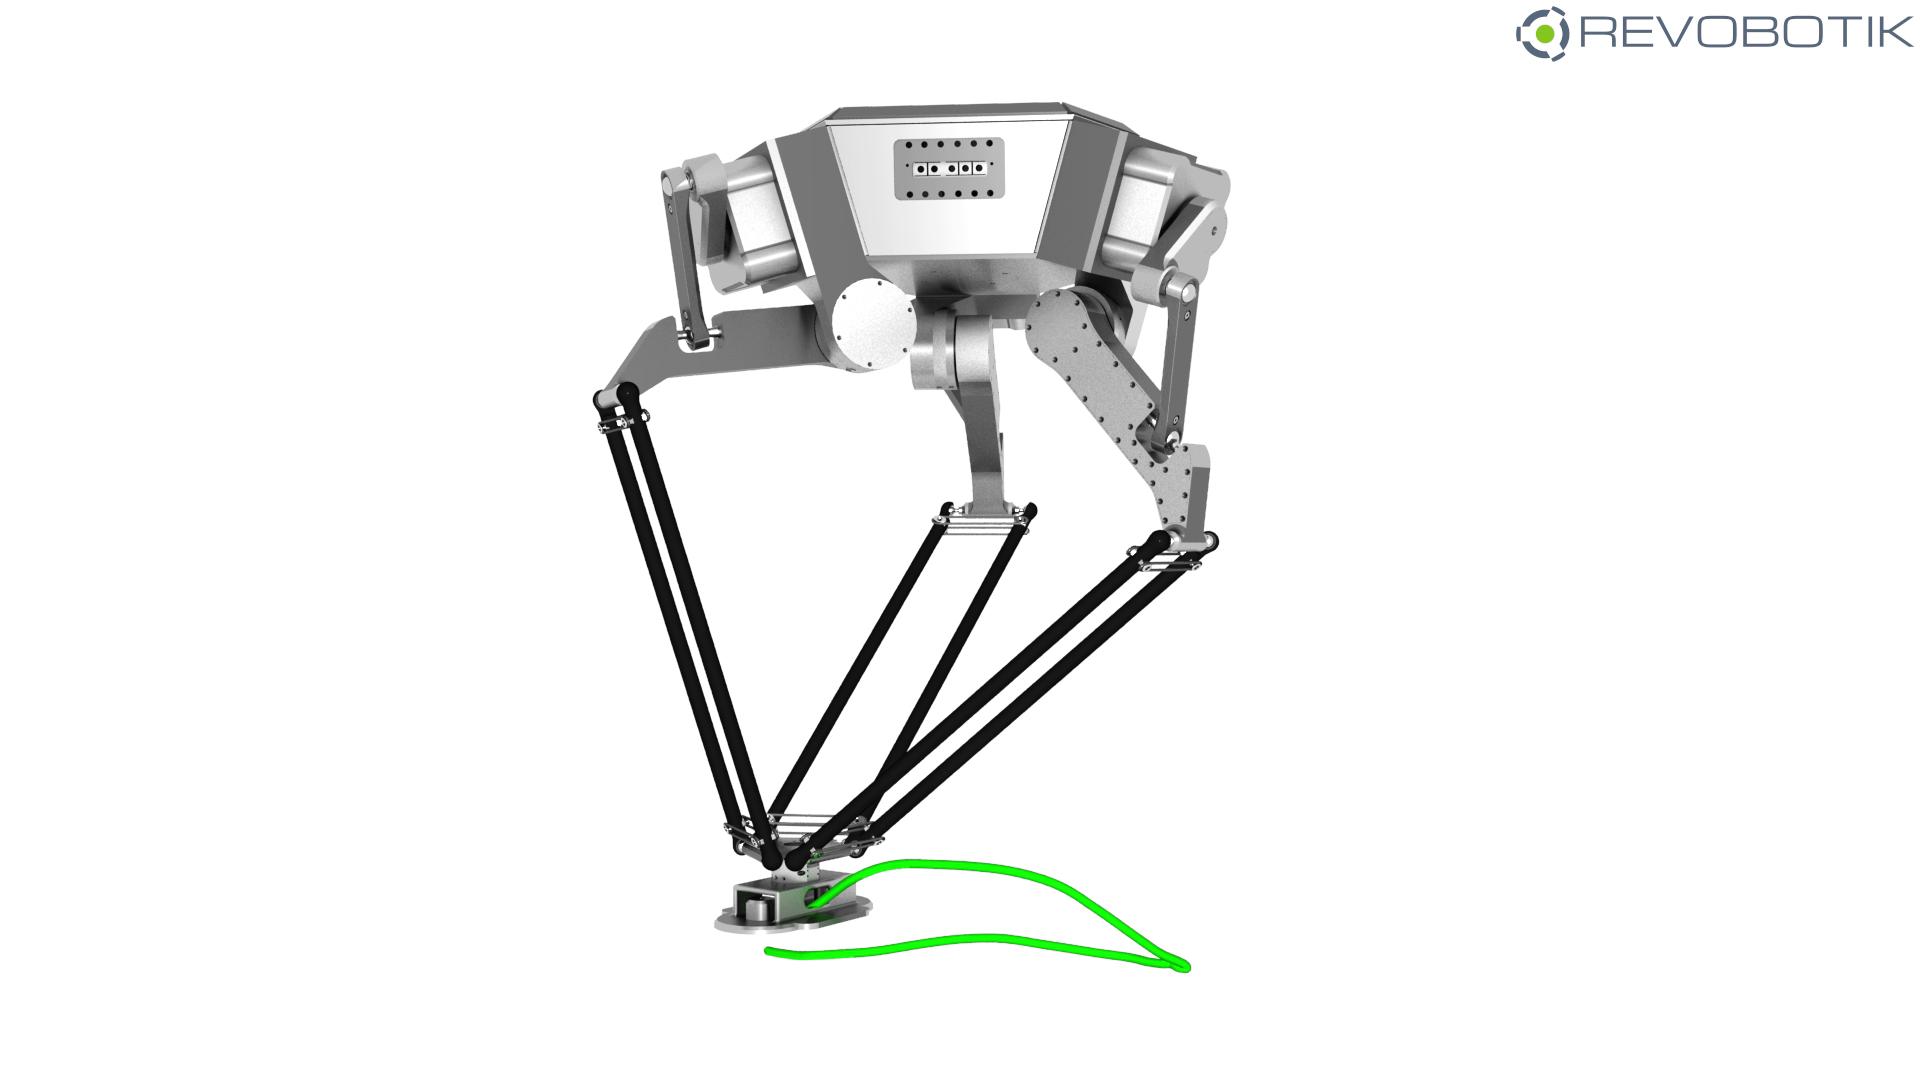 Deltarobot